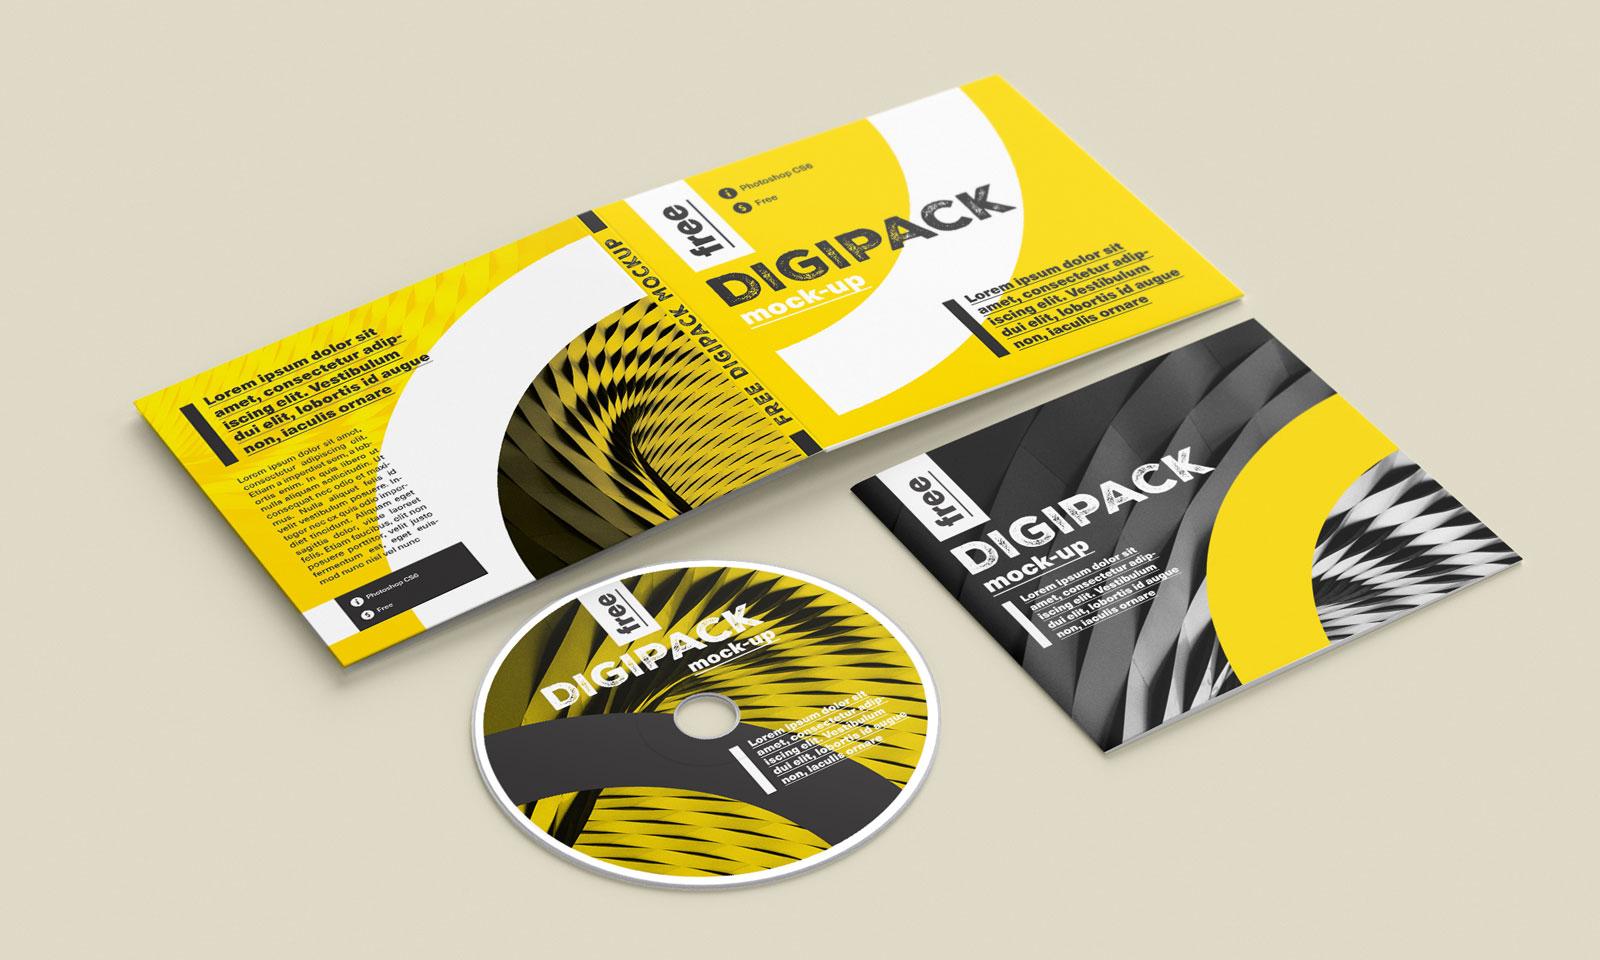 Free-CD-Disc-DVD-Case-Digipack-Mockup-PSD